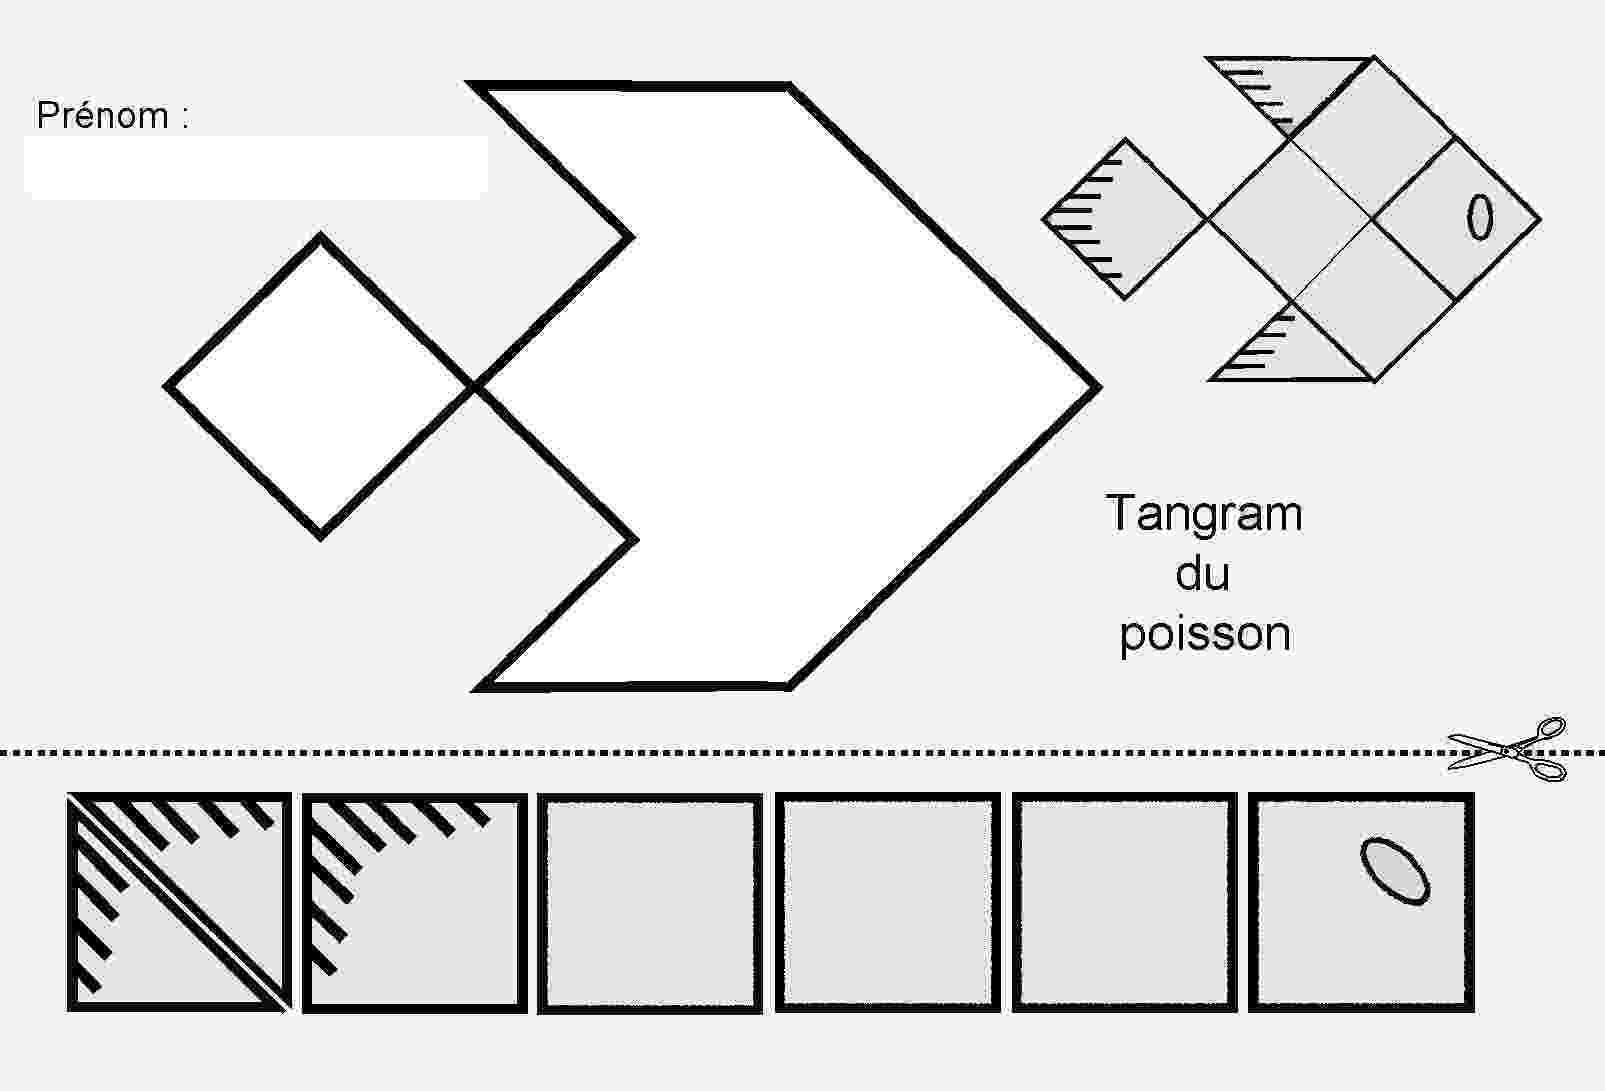 tangram frog 299 best images about origami tangram kirigami on tangram frog